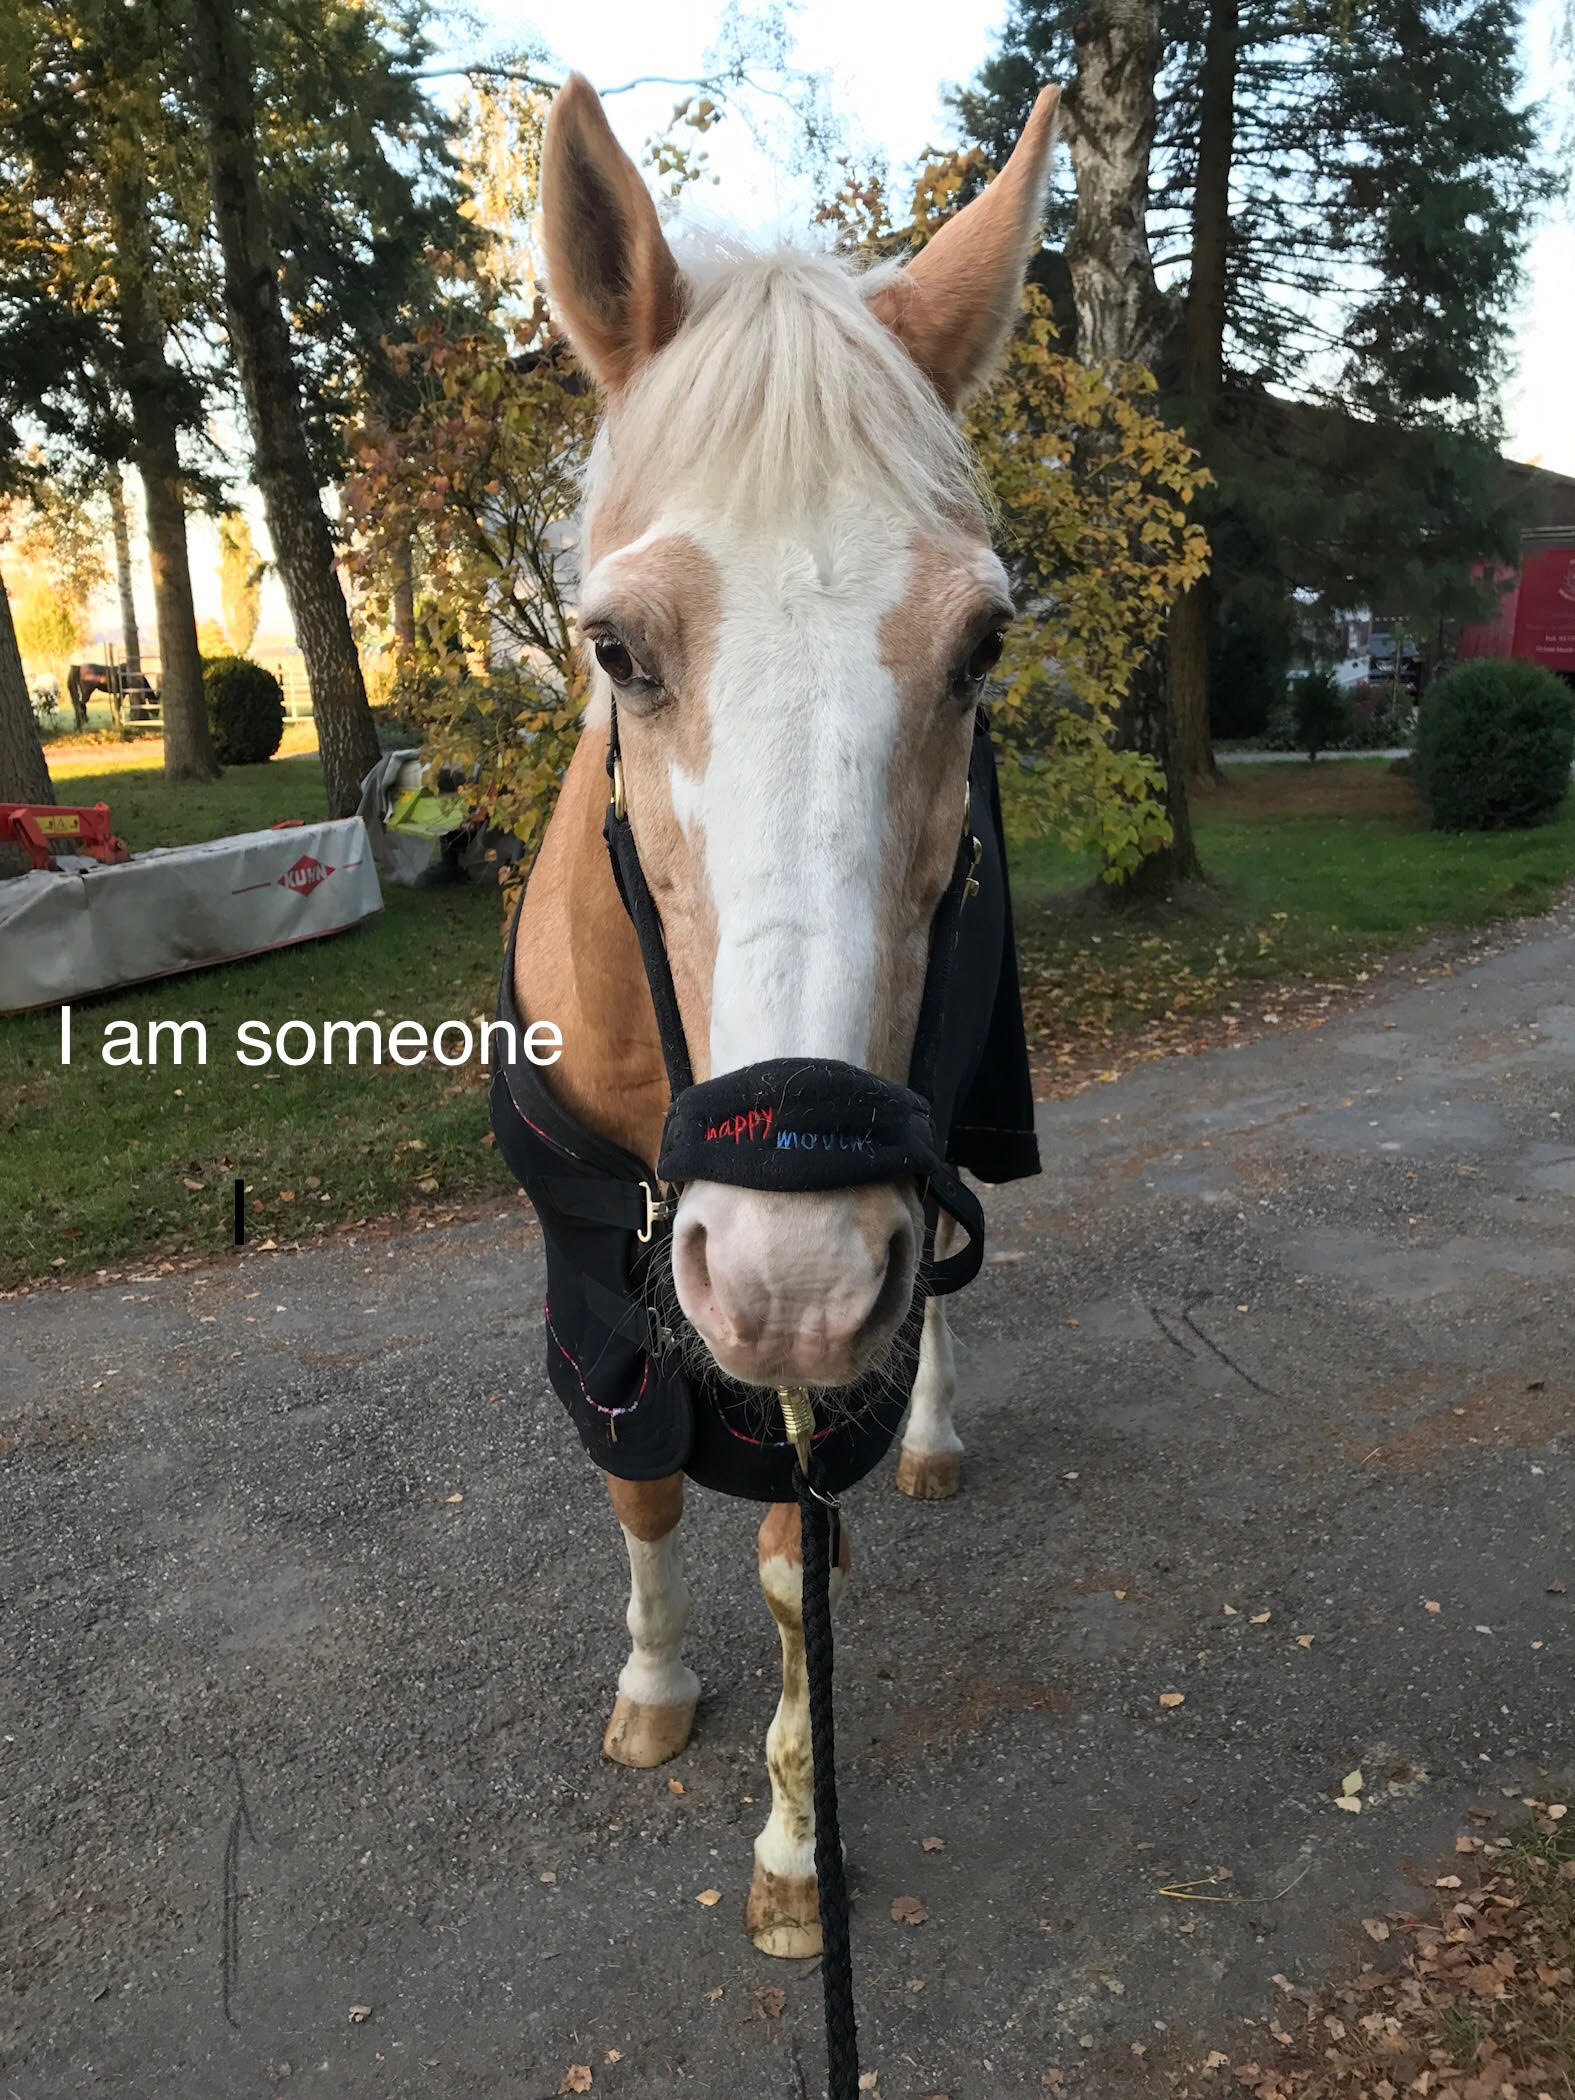 I am someone